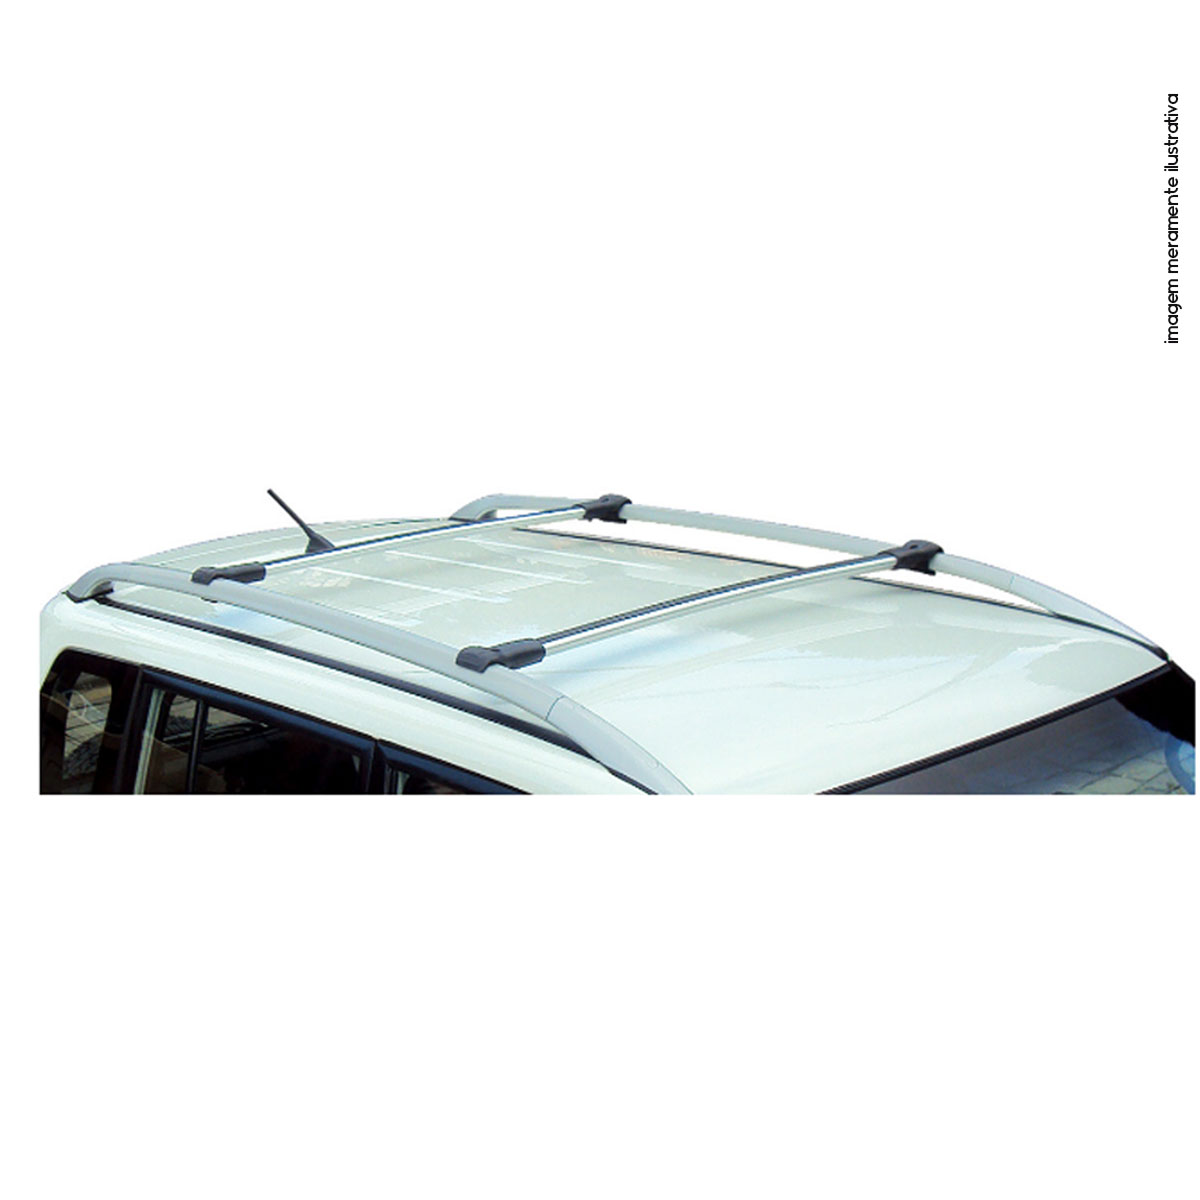 Travessa rack de teto larga alumínio Airtrek 2003 a 2008